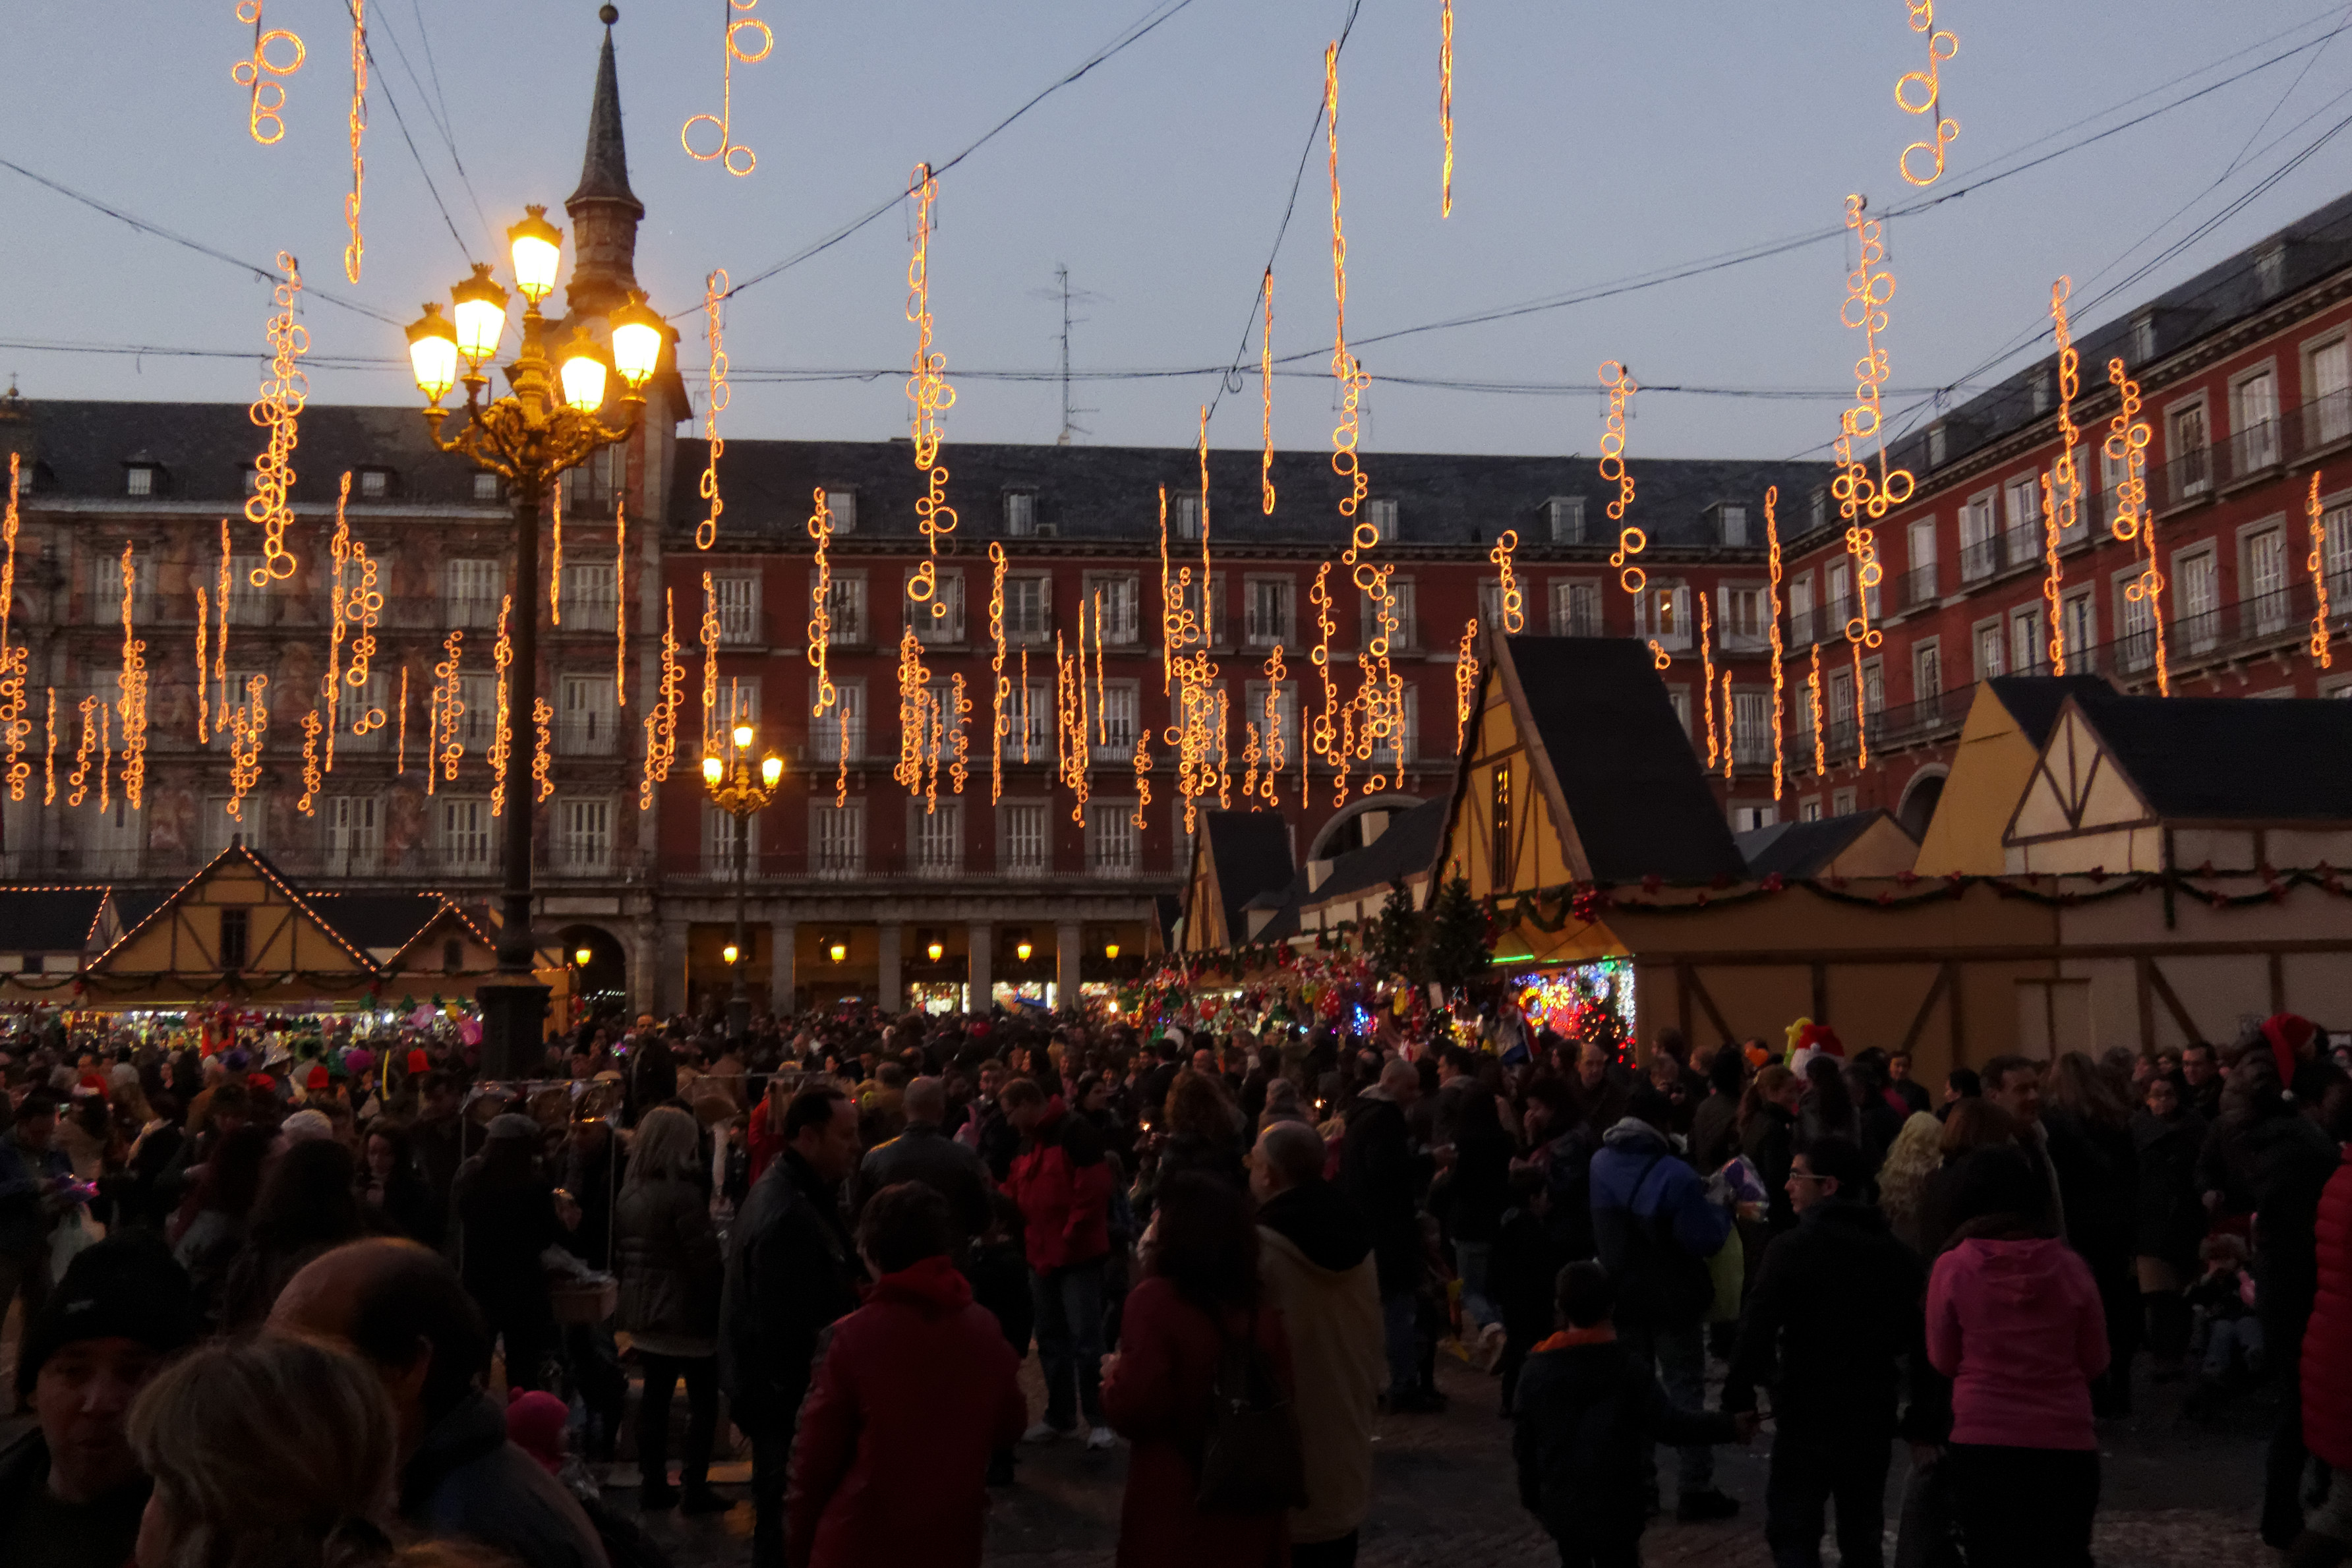 Pasa un fin de semana navide o en madrid o barcelona - Mercado de navidad en madrid ...